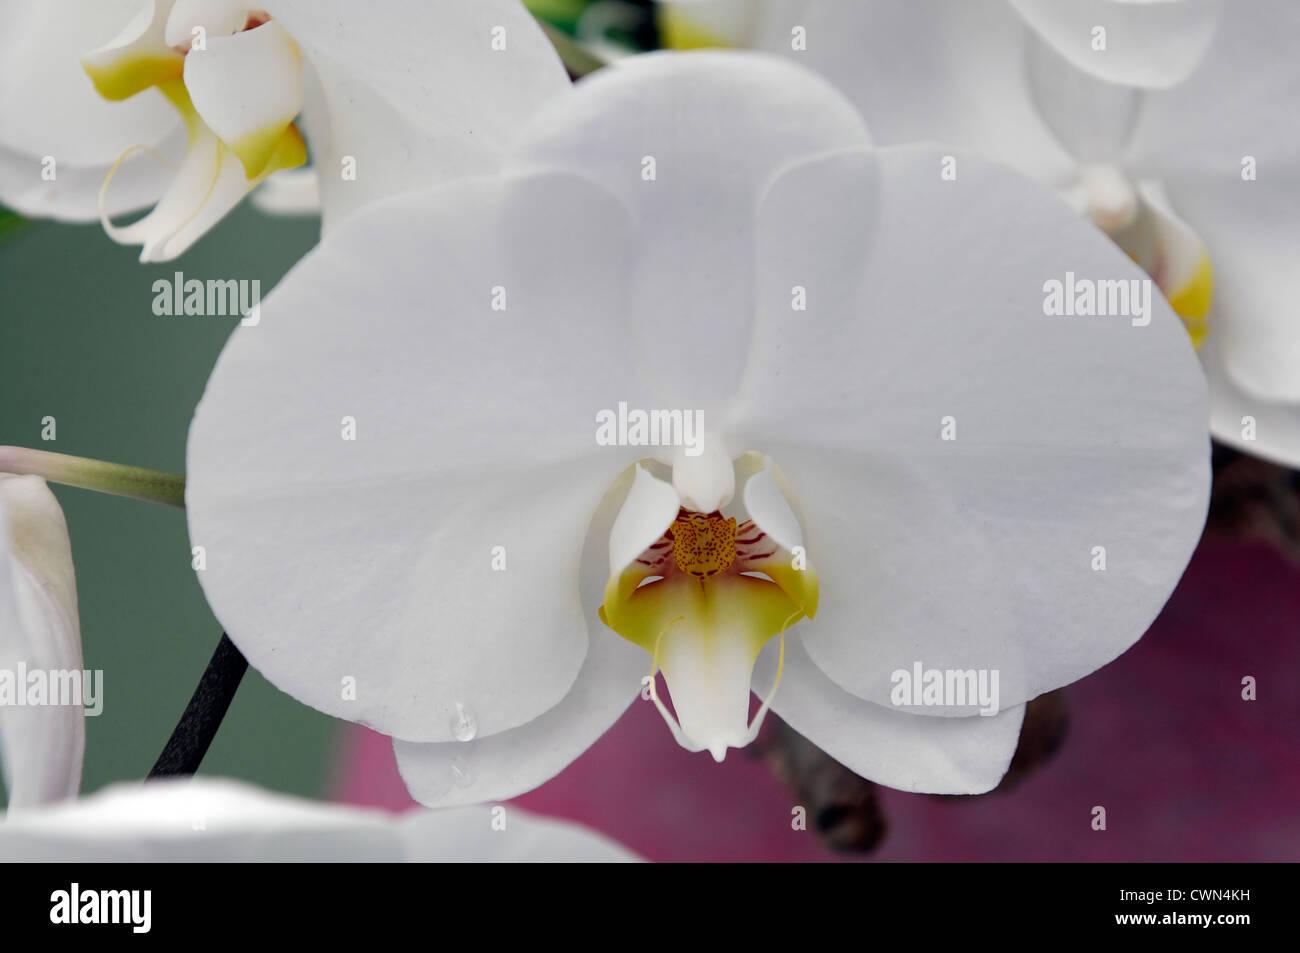 phalaenopsis phalboxi kobe moth orchid selective focus closeup plant portraits flowers petals houseplants tropical - Stock Image